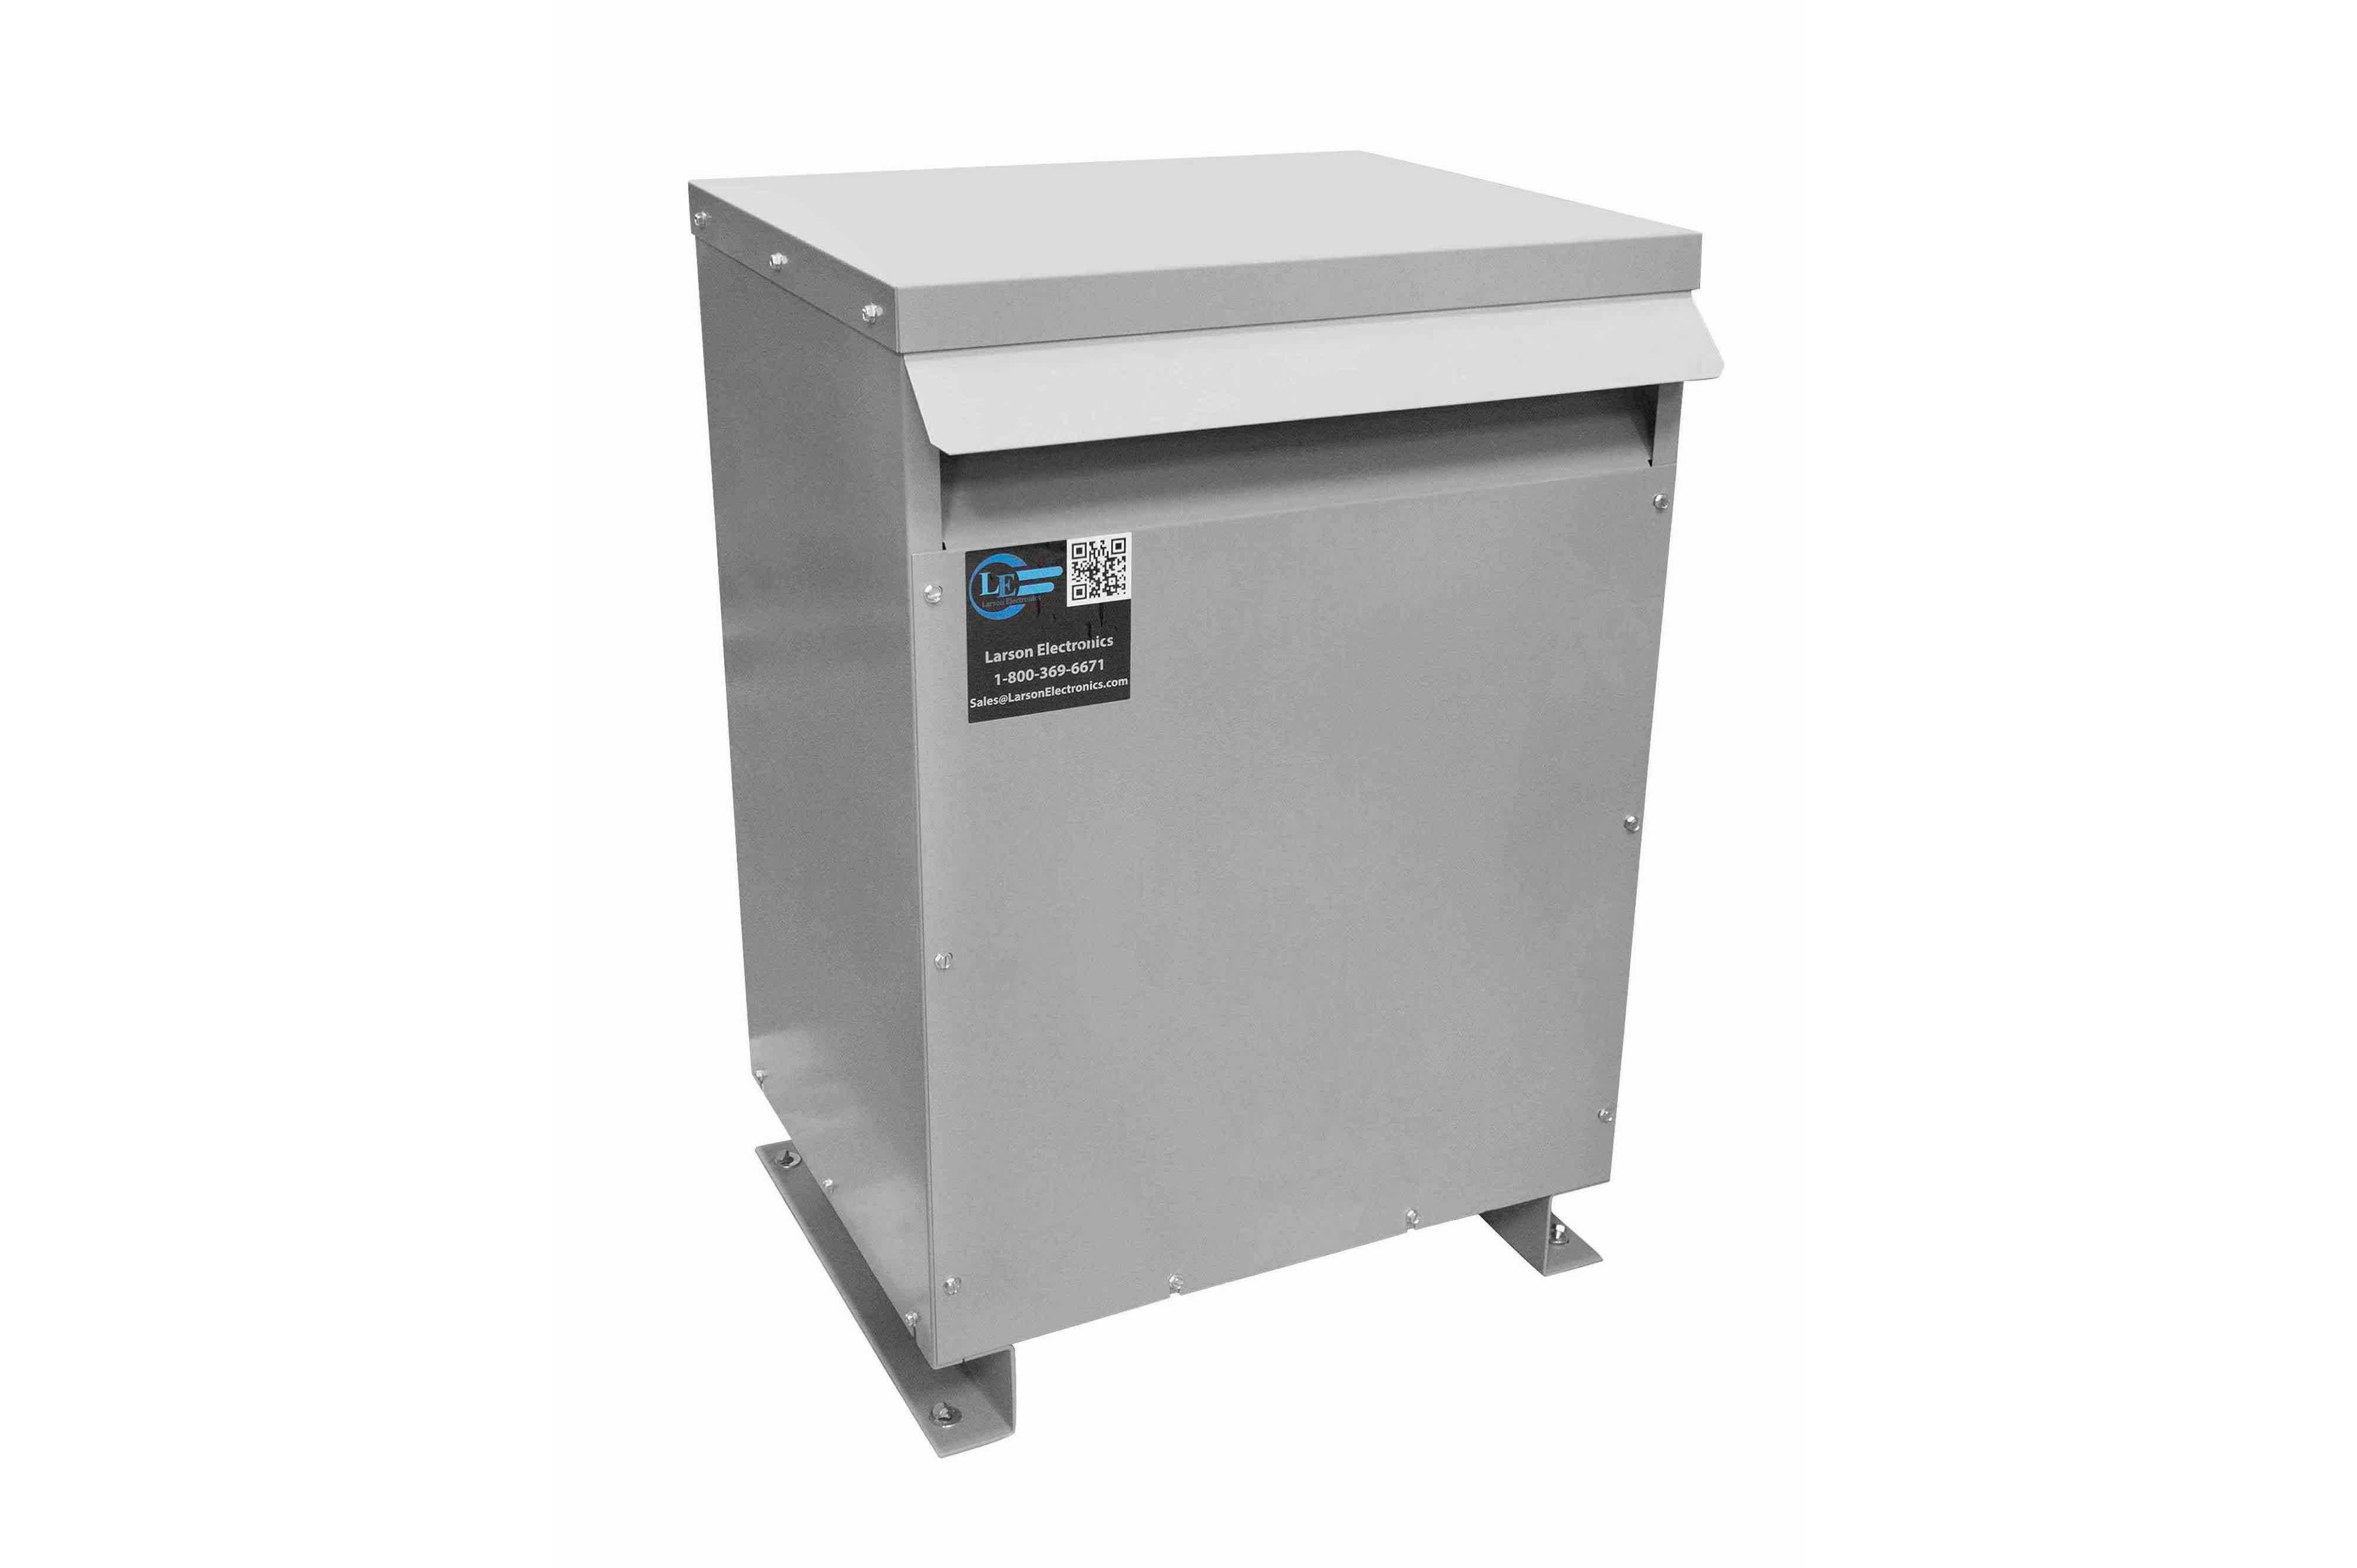 70 kVA 3PH Isolation Transformer, 460V Wye Primary, 575V Delta Secondary, N3R, Ventilated, 60 Hz